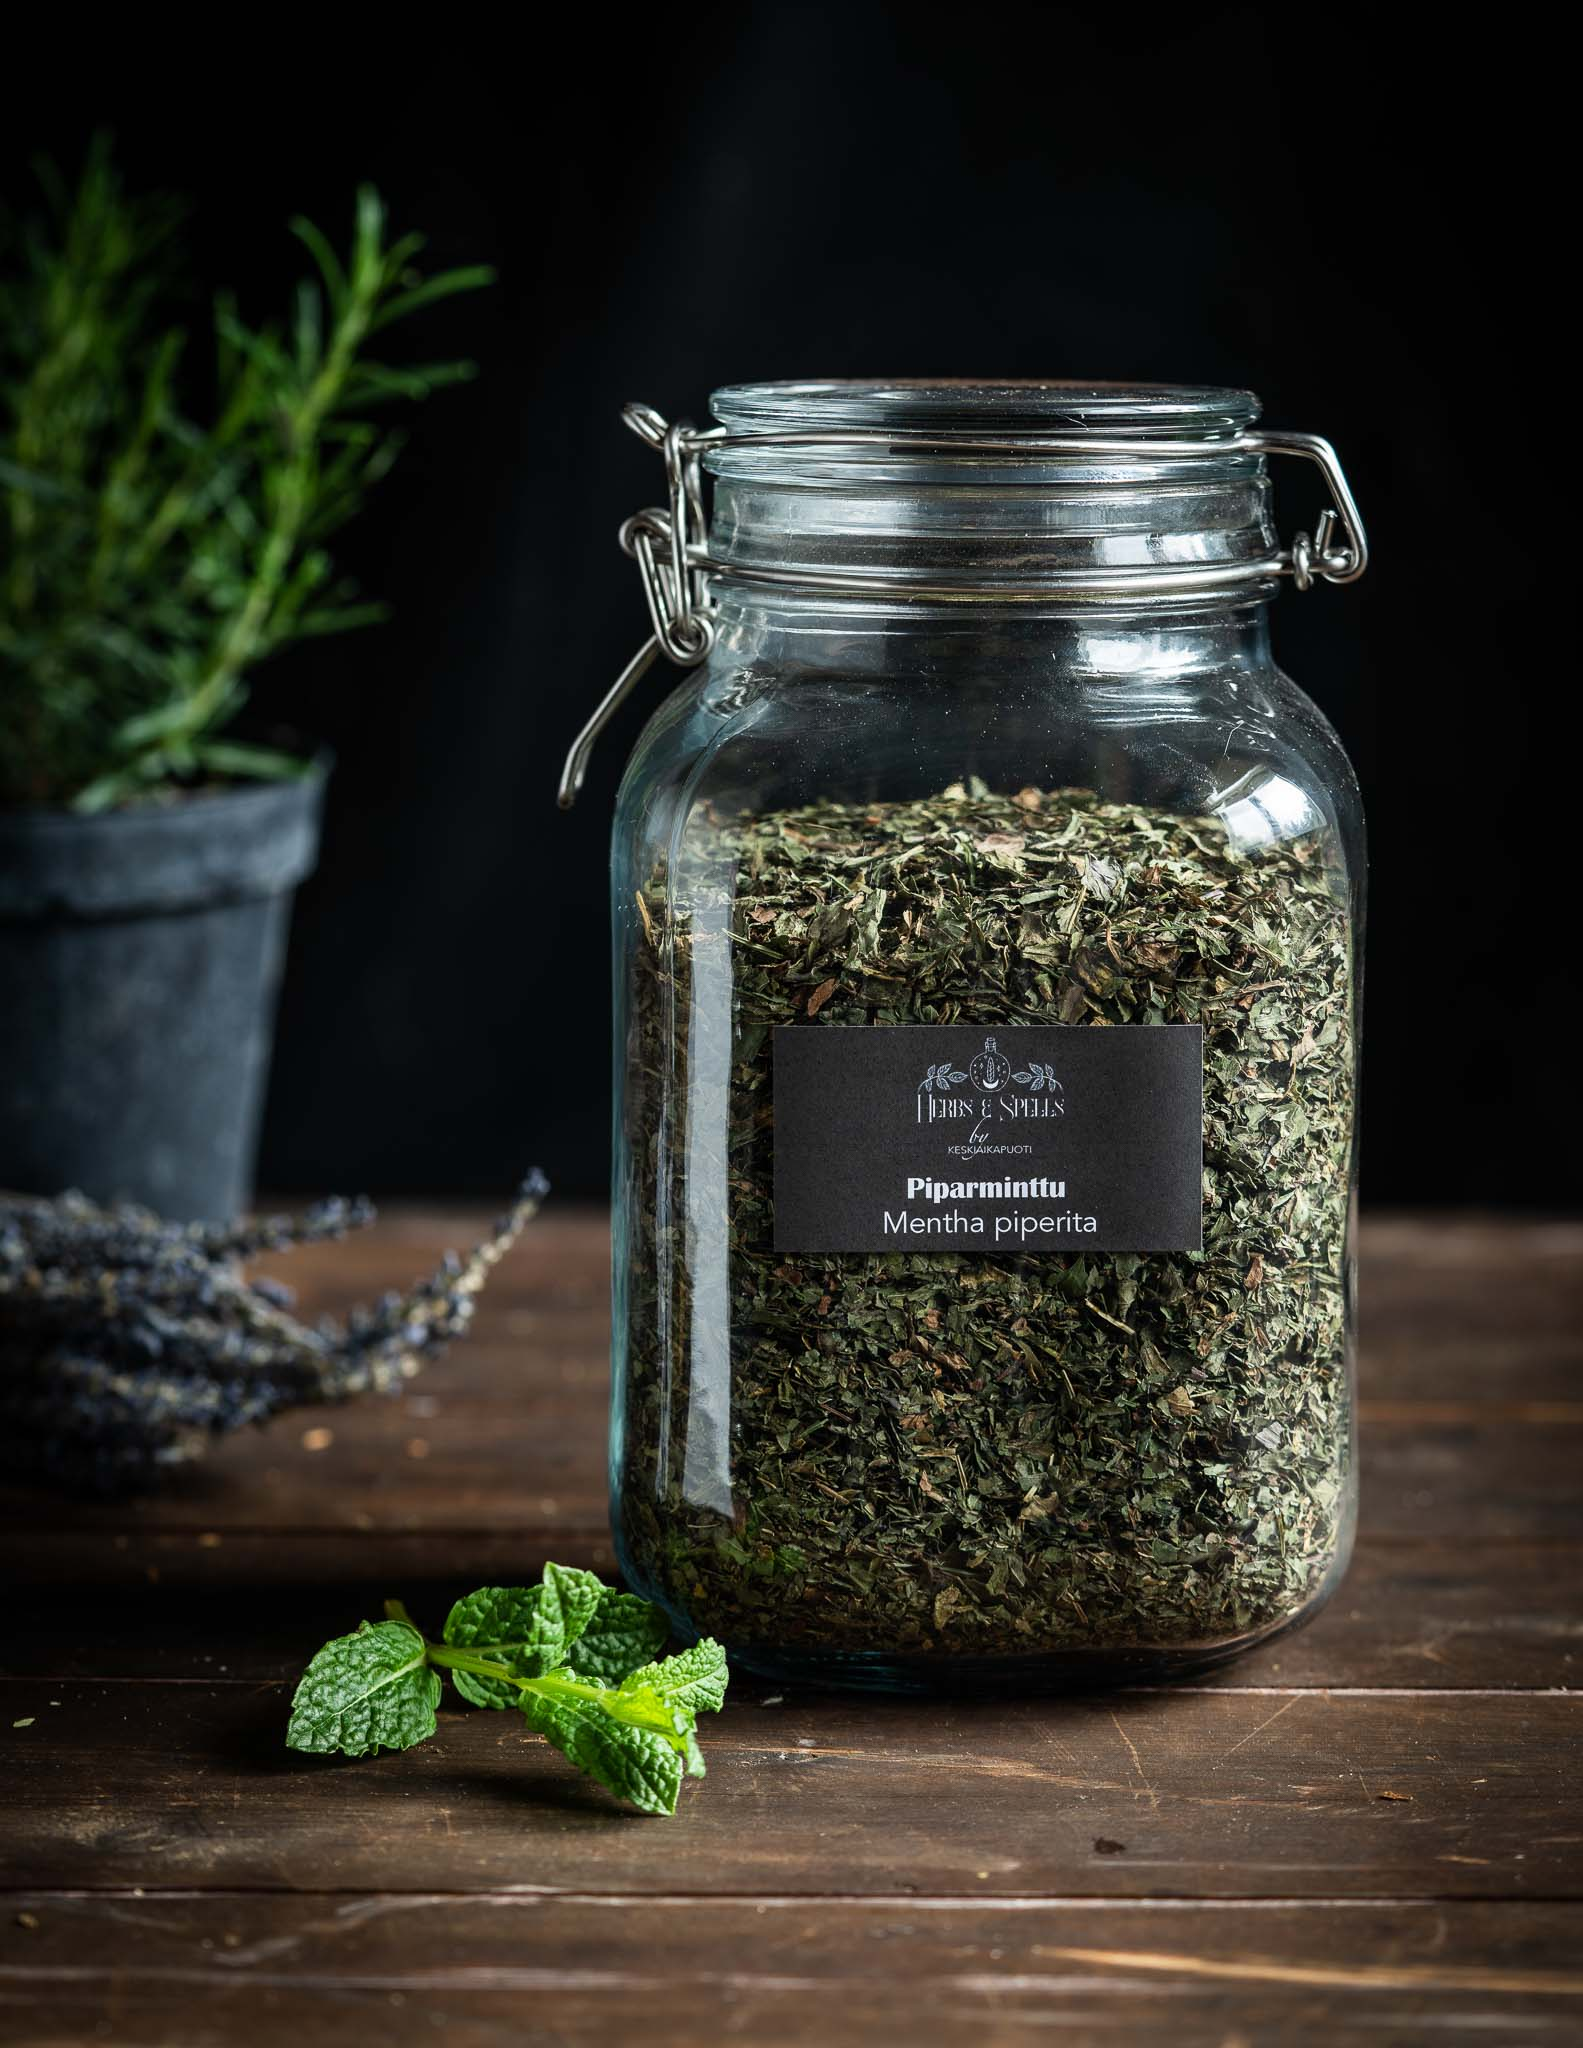 Piparminttu - Mentha x piperita (Herbs&Spell by keskiaikapuoti)